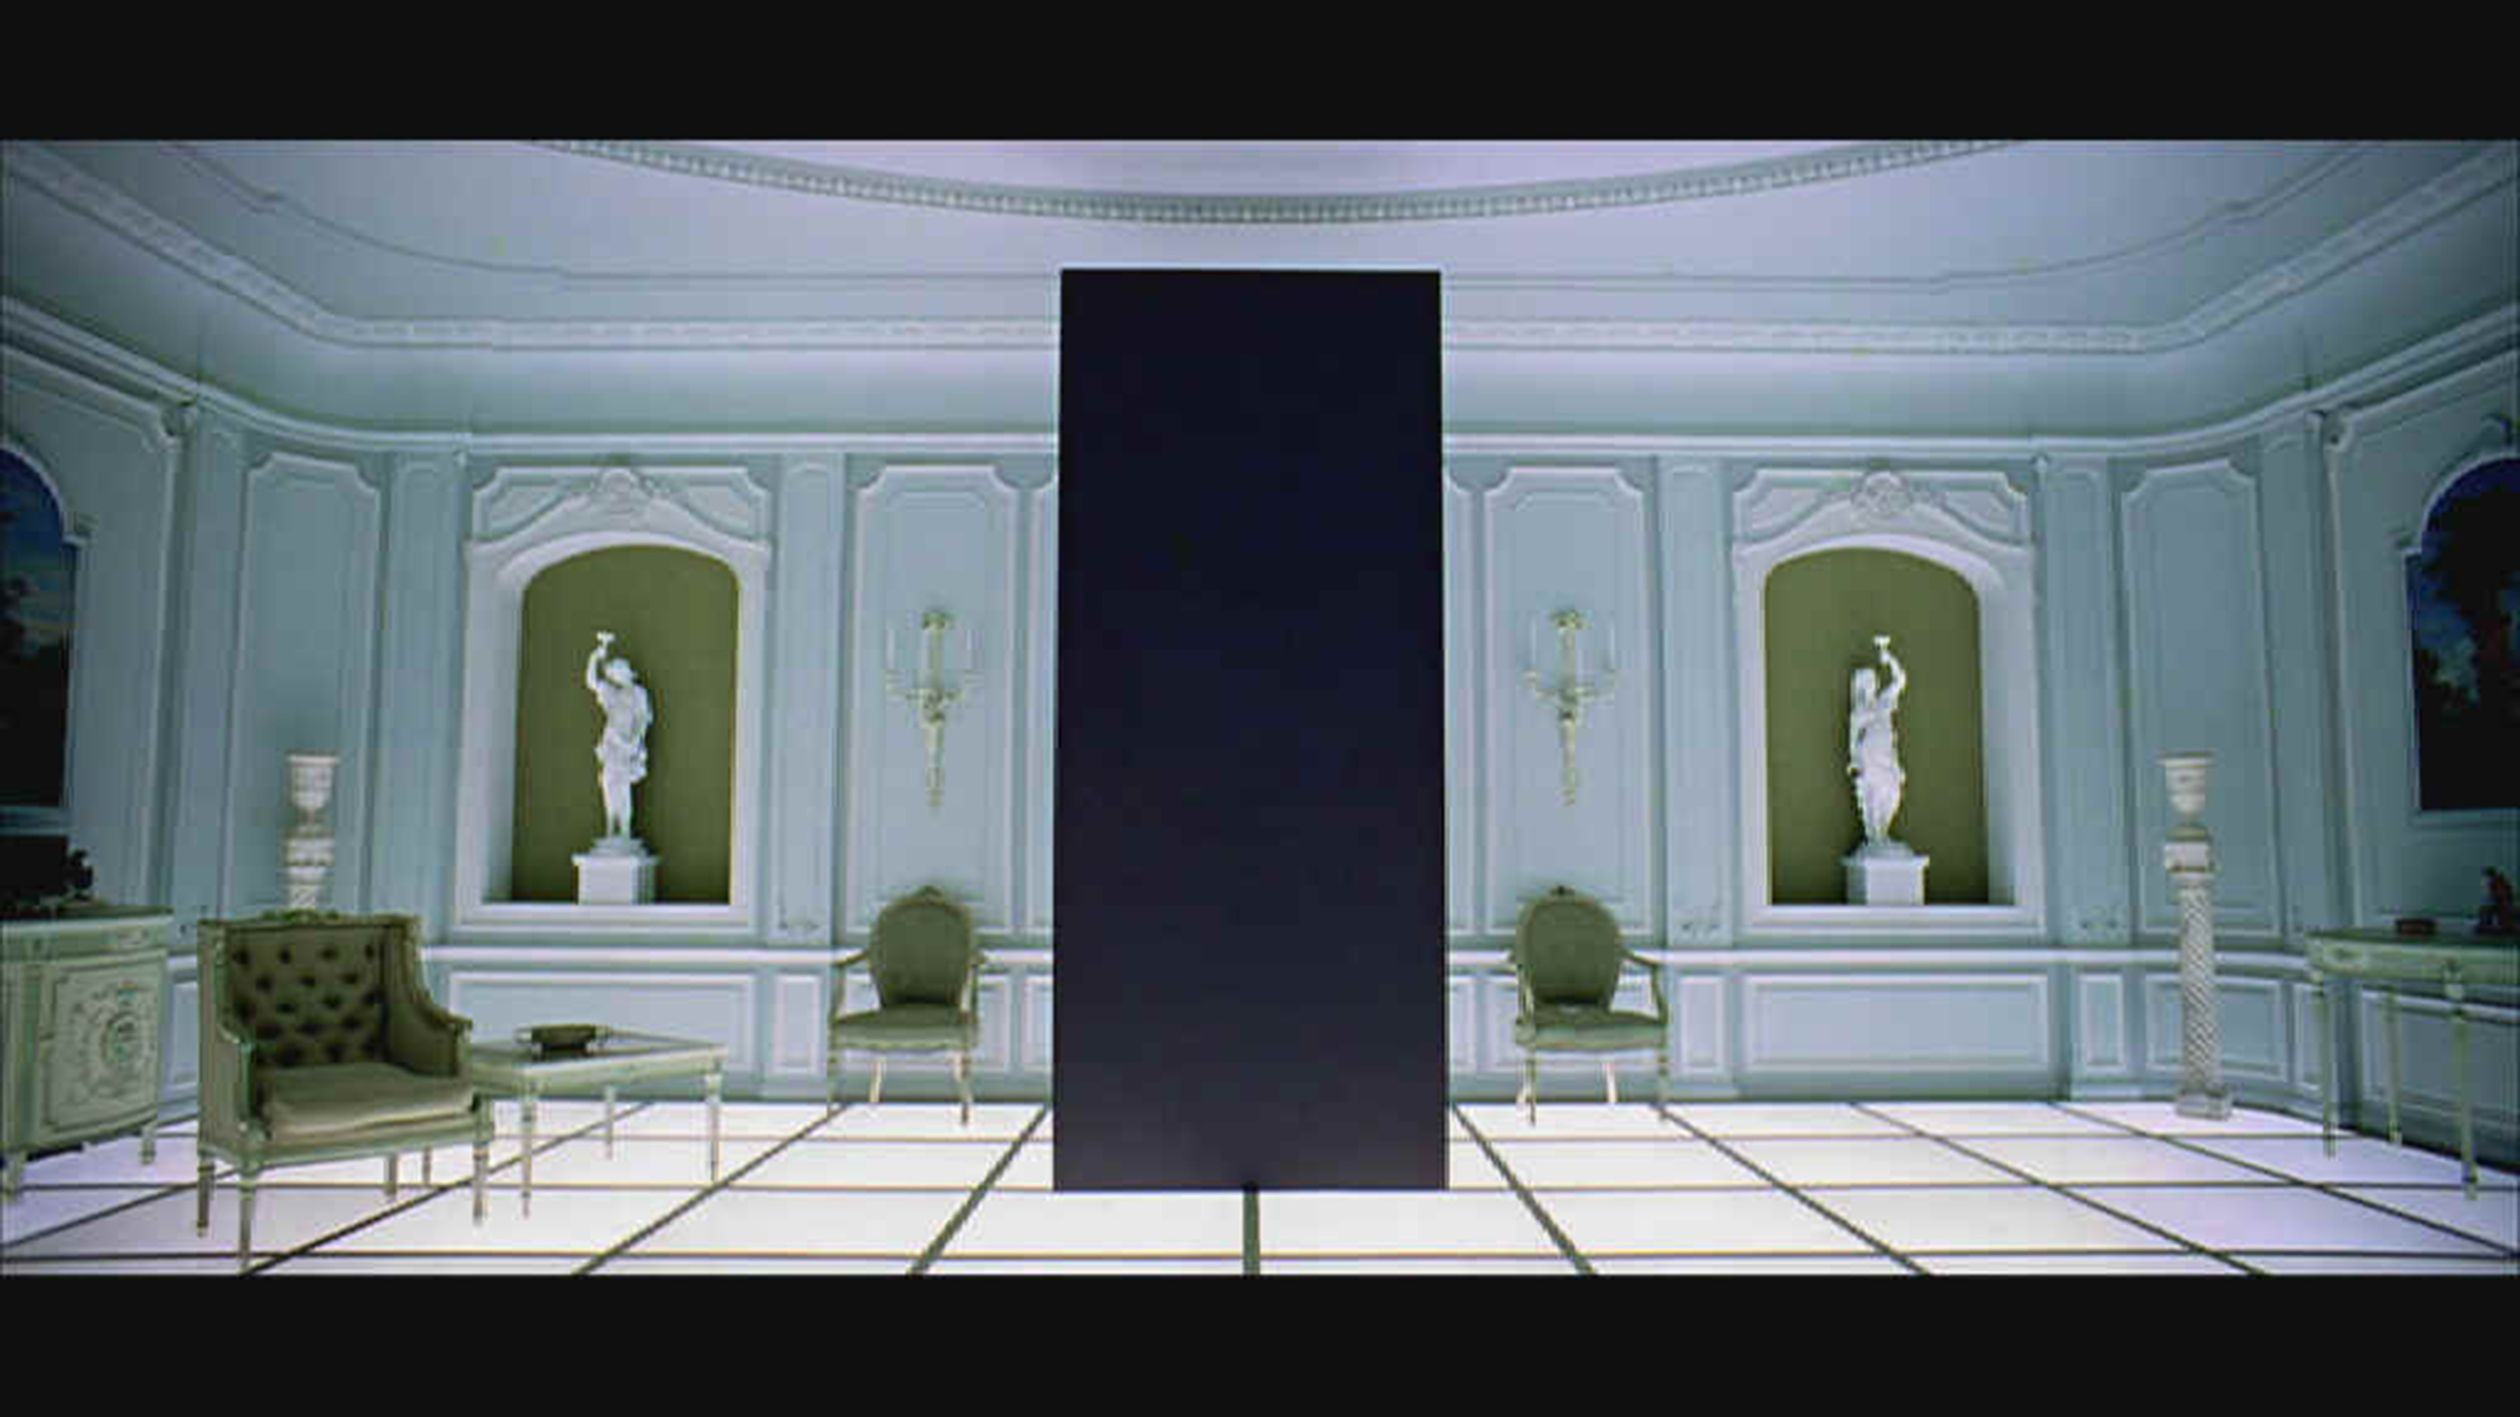 2001 L Odyssee De L Espace Stanley Kubrick Design Stanley Kubrick Decoration Interieure